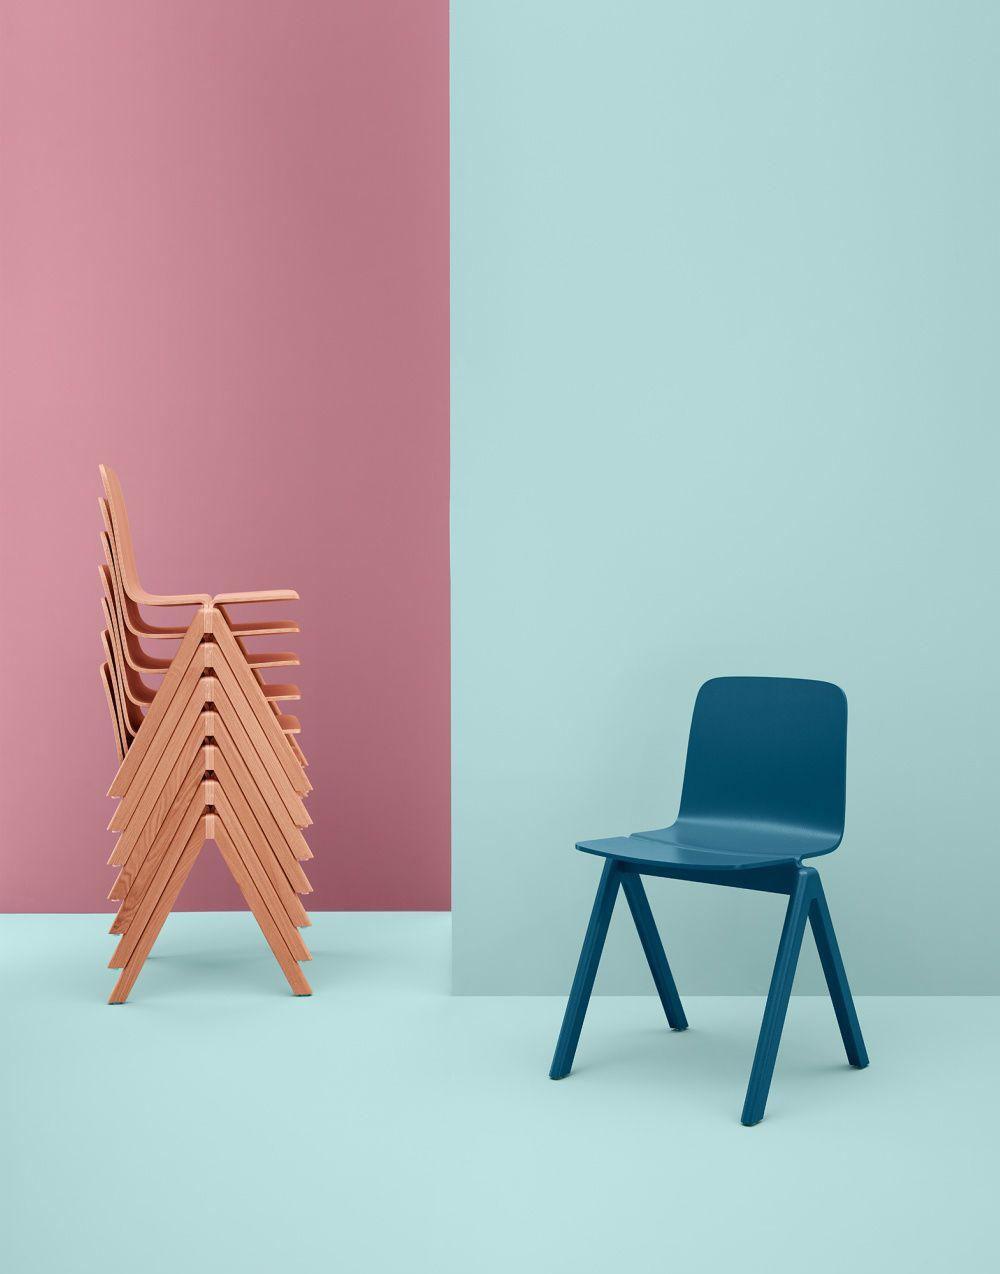 Ronan & Erwan Bouroullec contemporary wooden stacking chair - copenhague by ronan